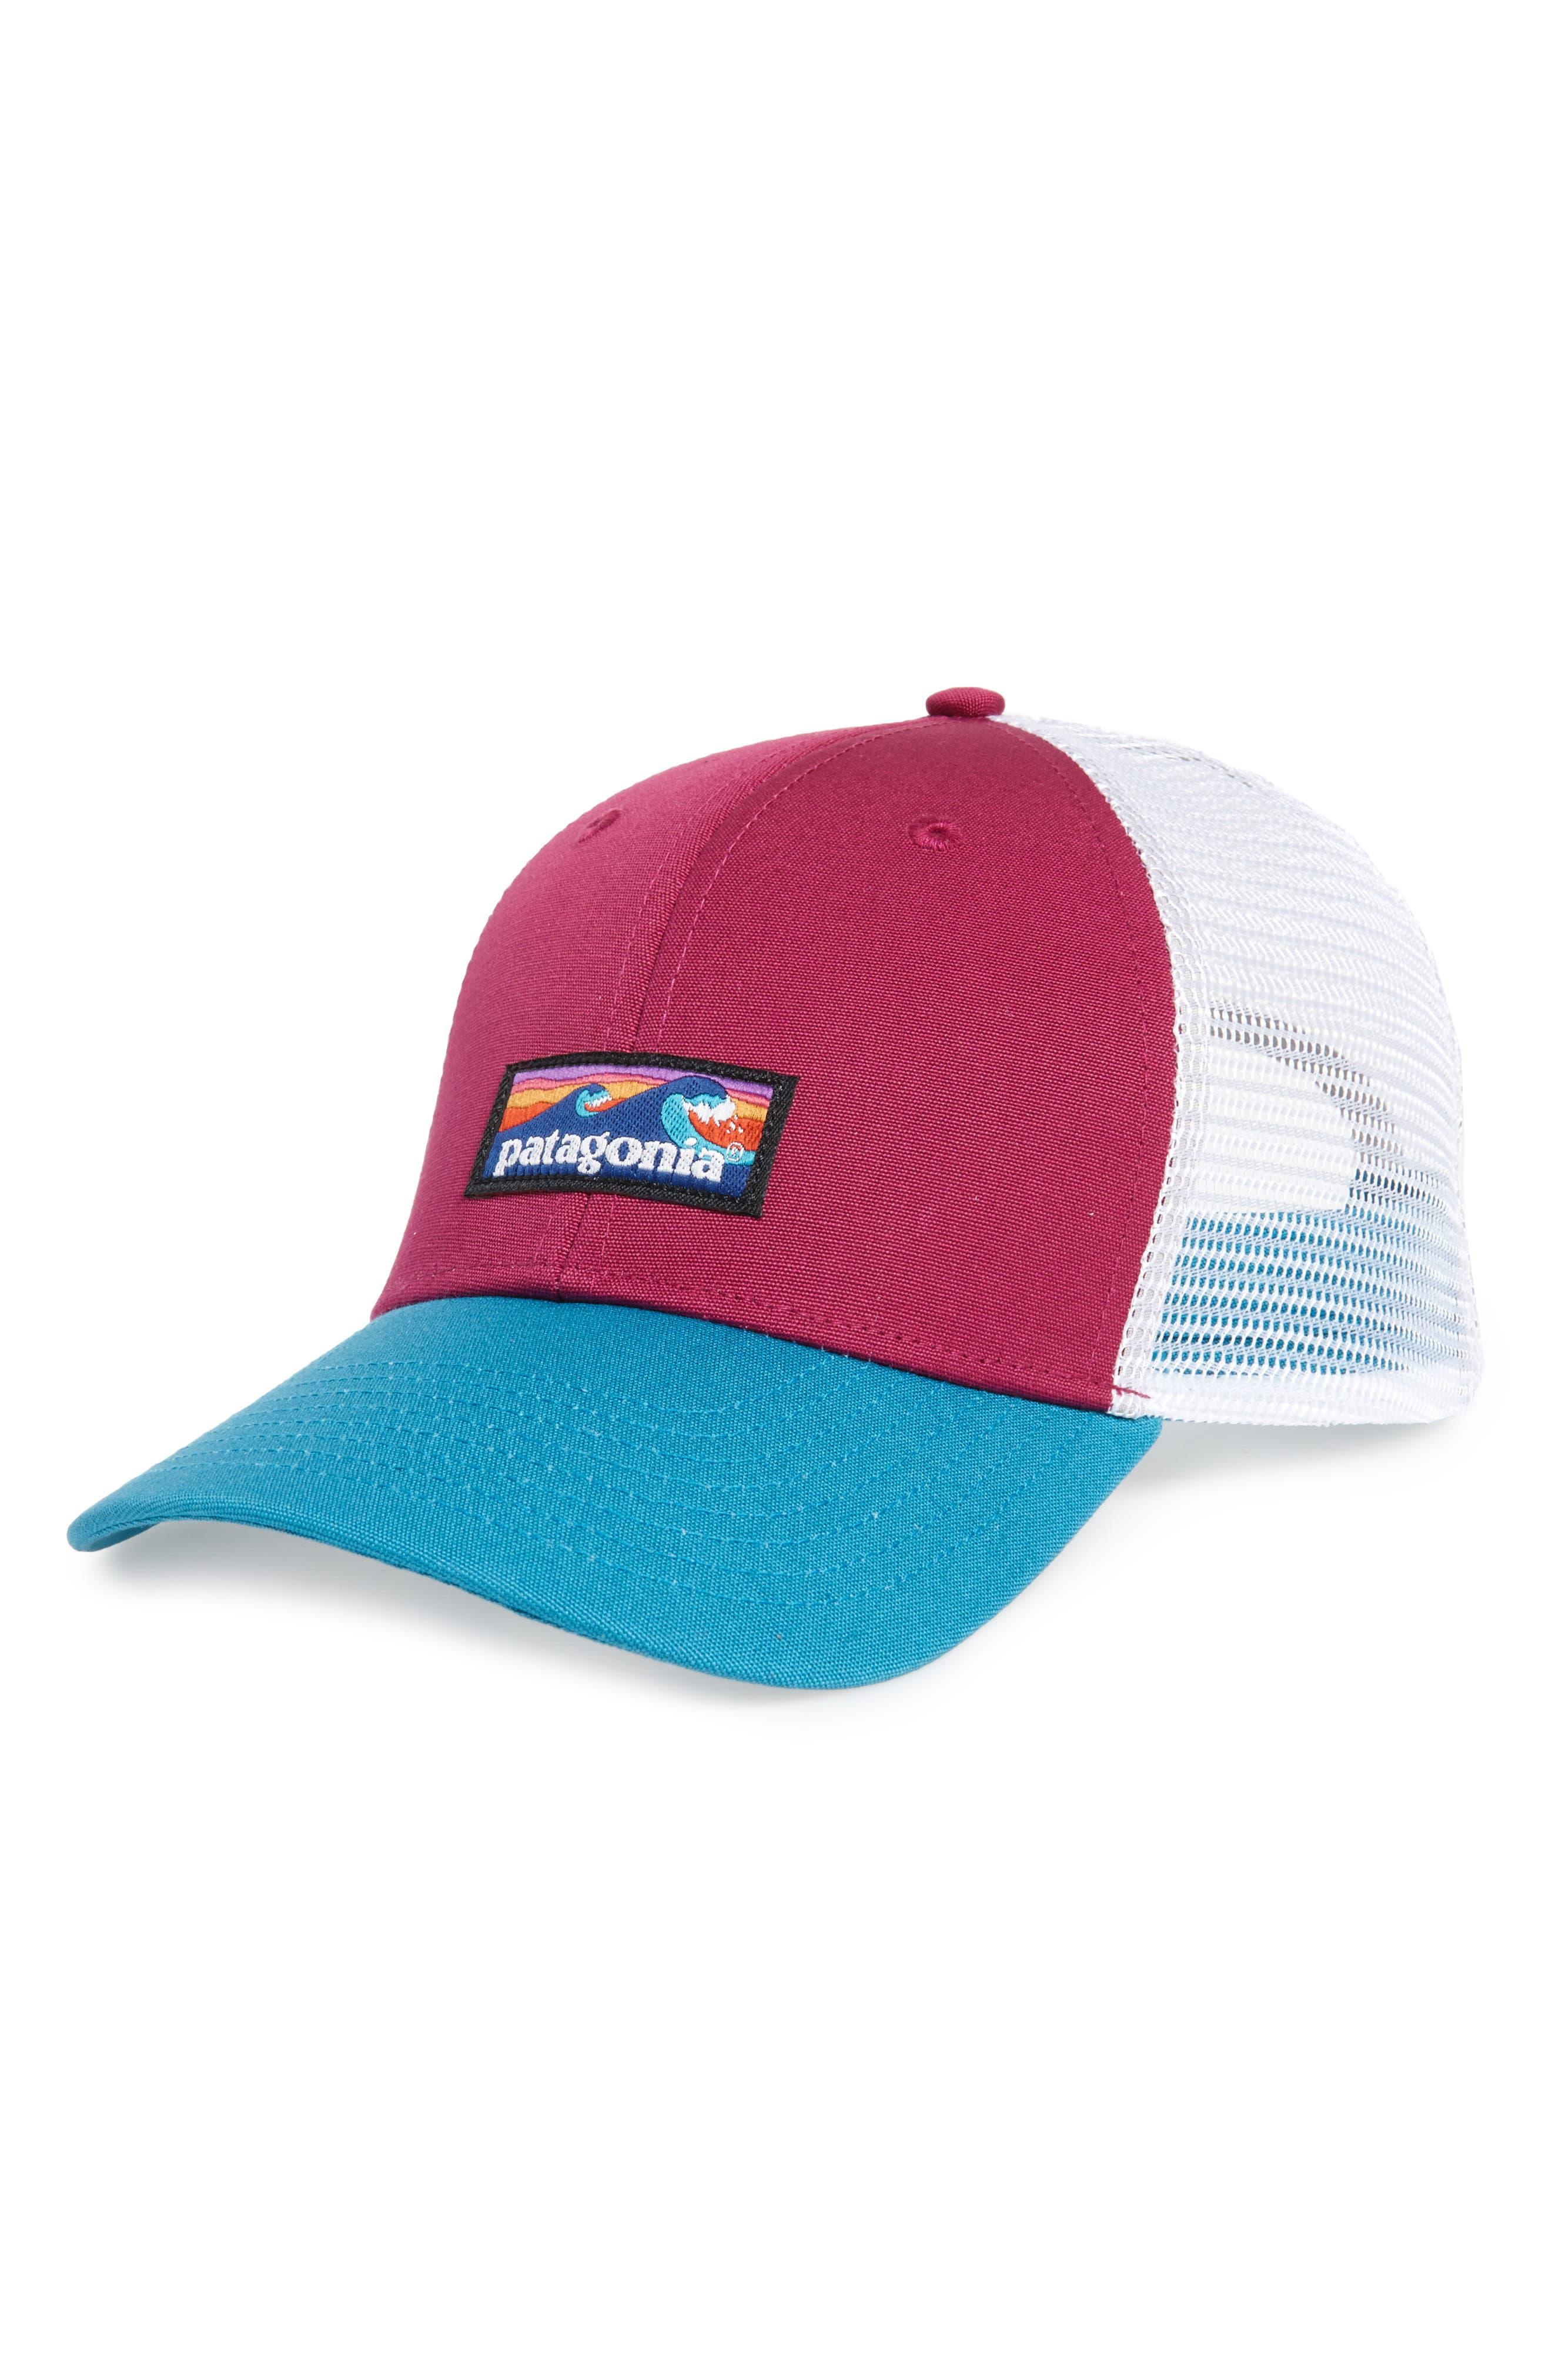 Alternate Image 1 Selected - Patagonia Board Short Trucker Hat